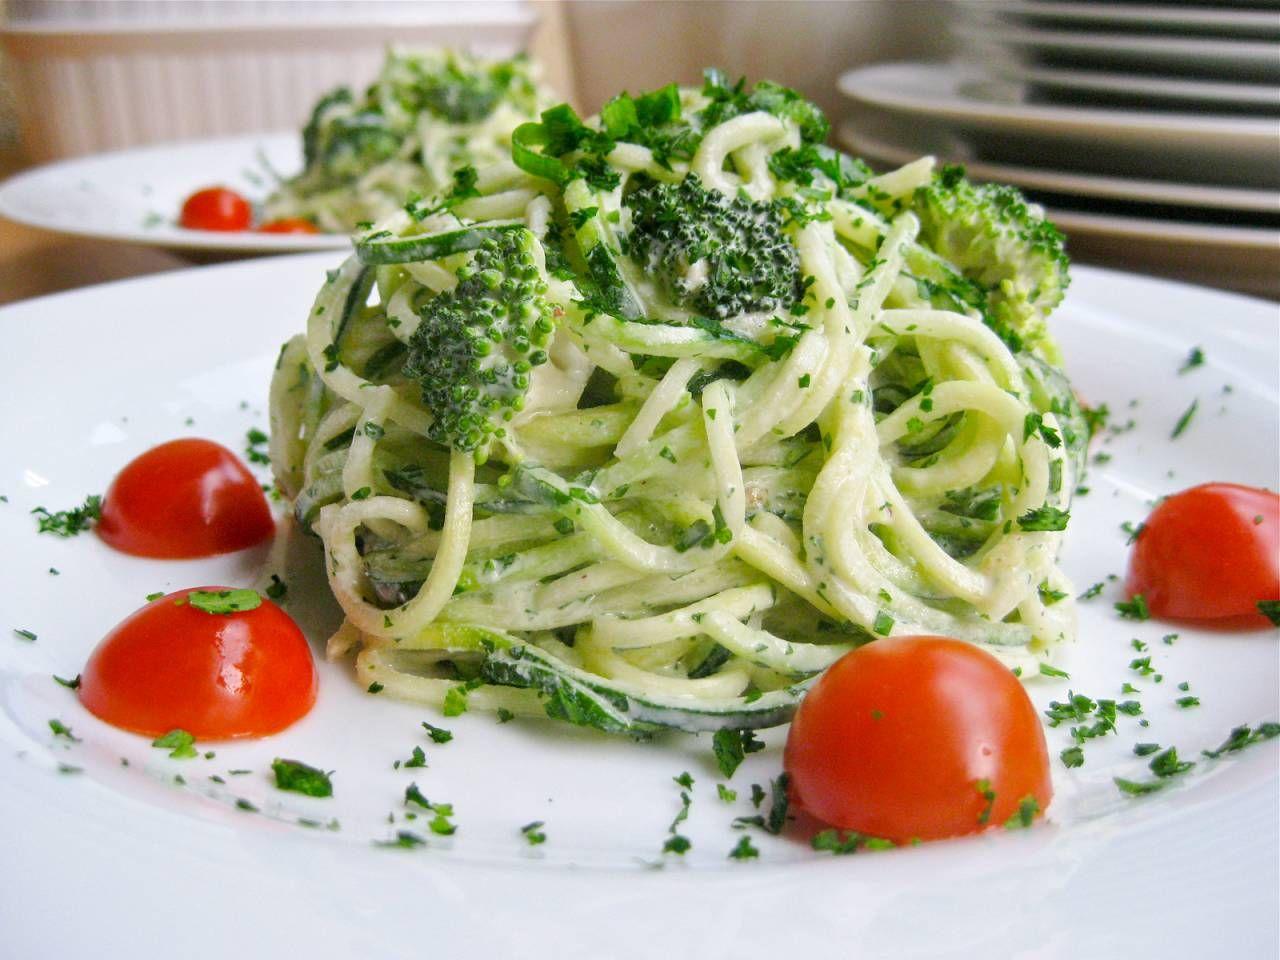 Raw Vegan Alfredo With Broccoli The Blender Girl Healthy Blender Recipes Raw Vegan Vegan Alfredo